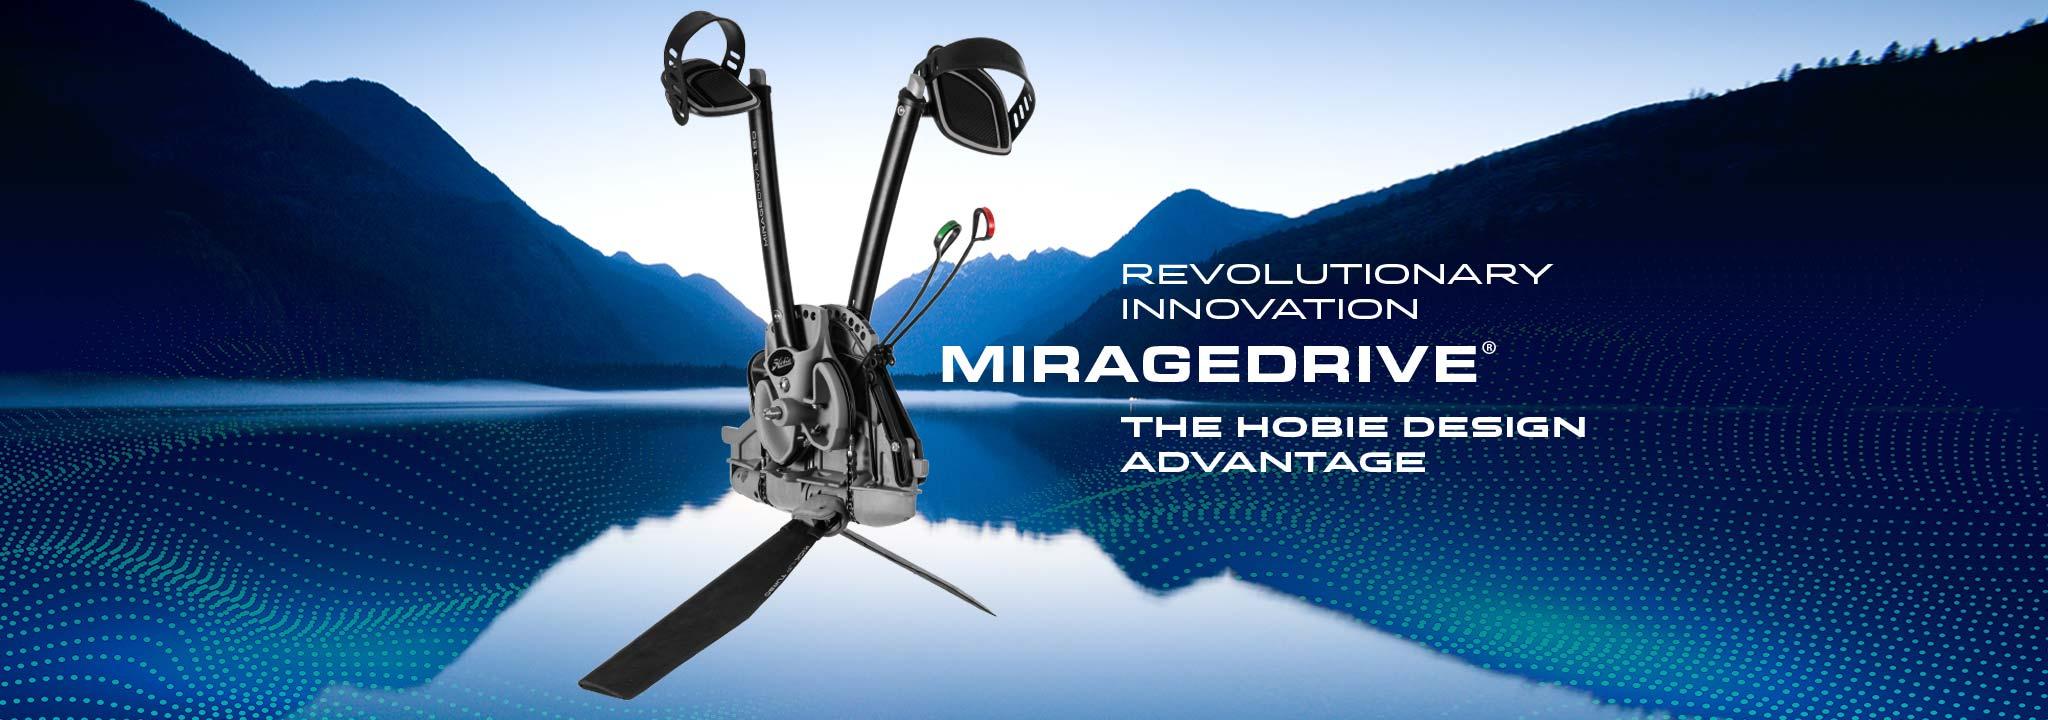 Mirage Drive 180